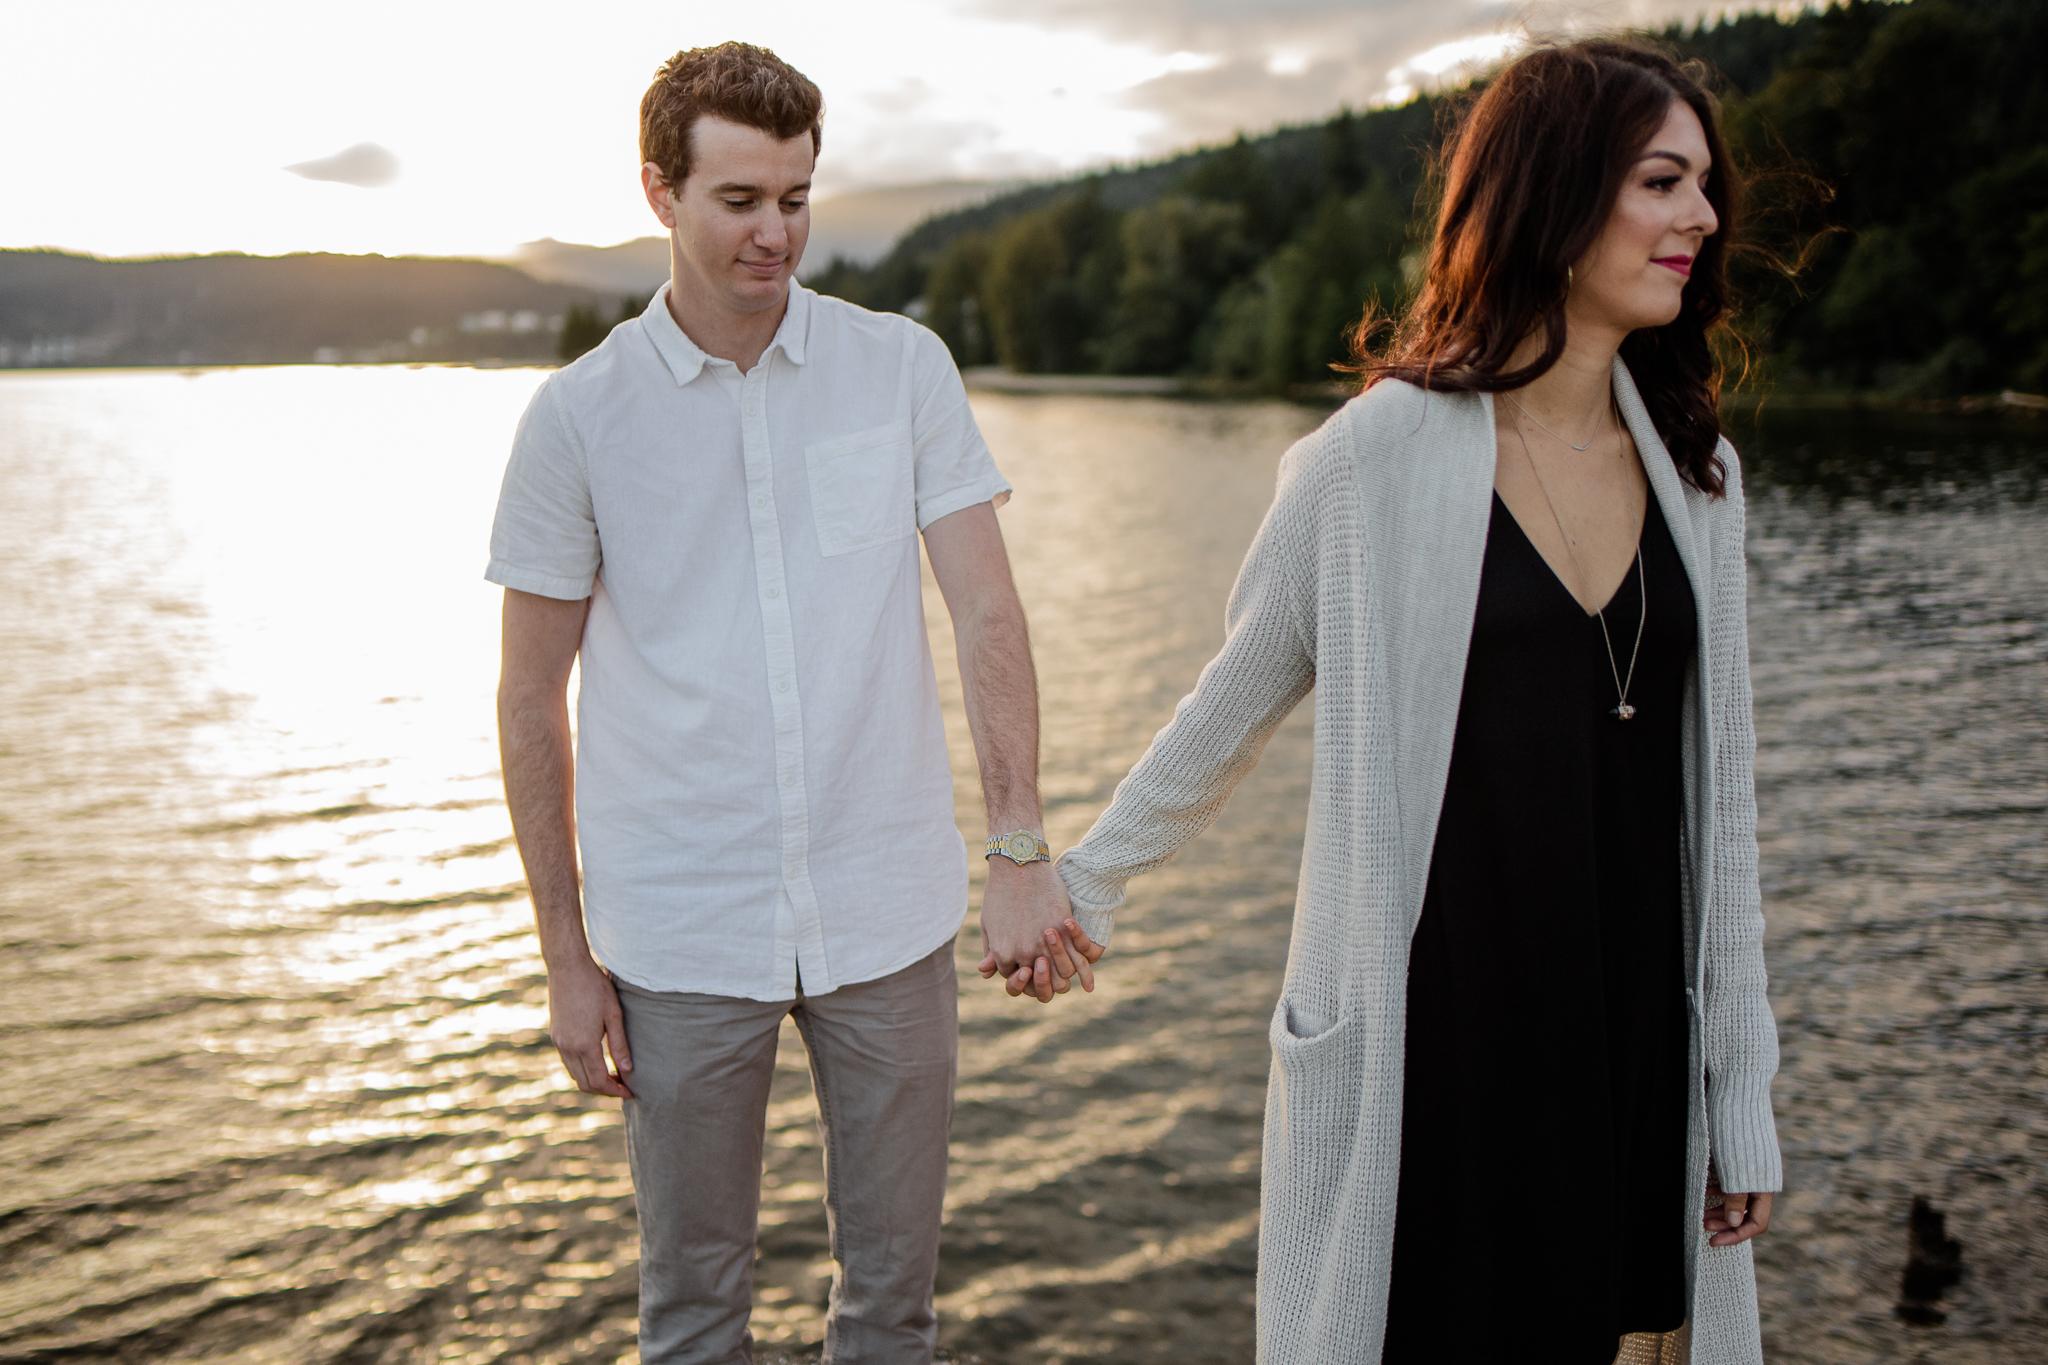 Photo of Buntzen Lake Anmore British Columbia Landscape Best Fun Engagement Photographer Port Moody Wedding Sunset Romantic Couple Photos 169.jpg